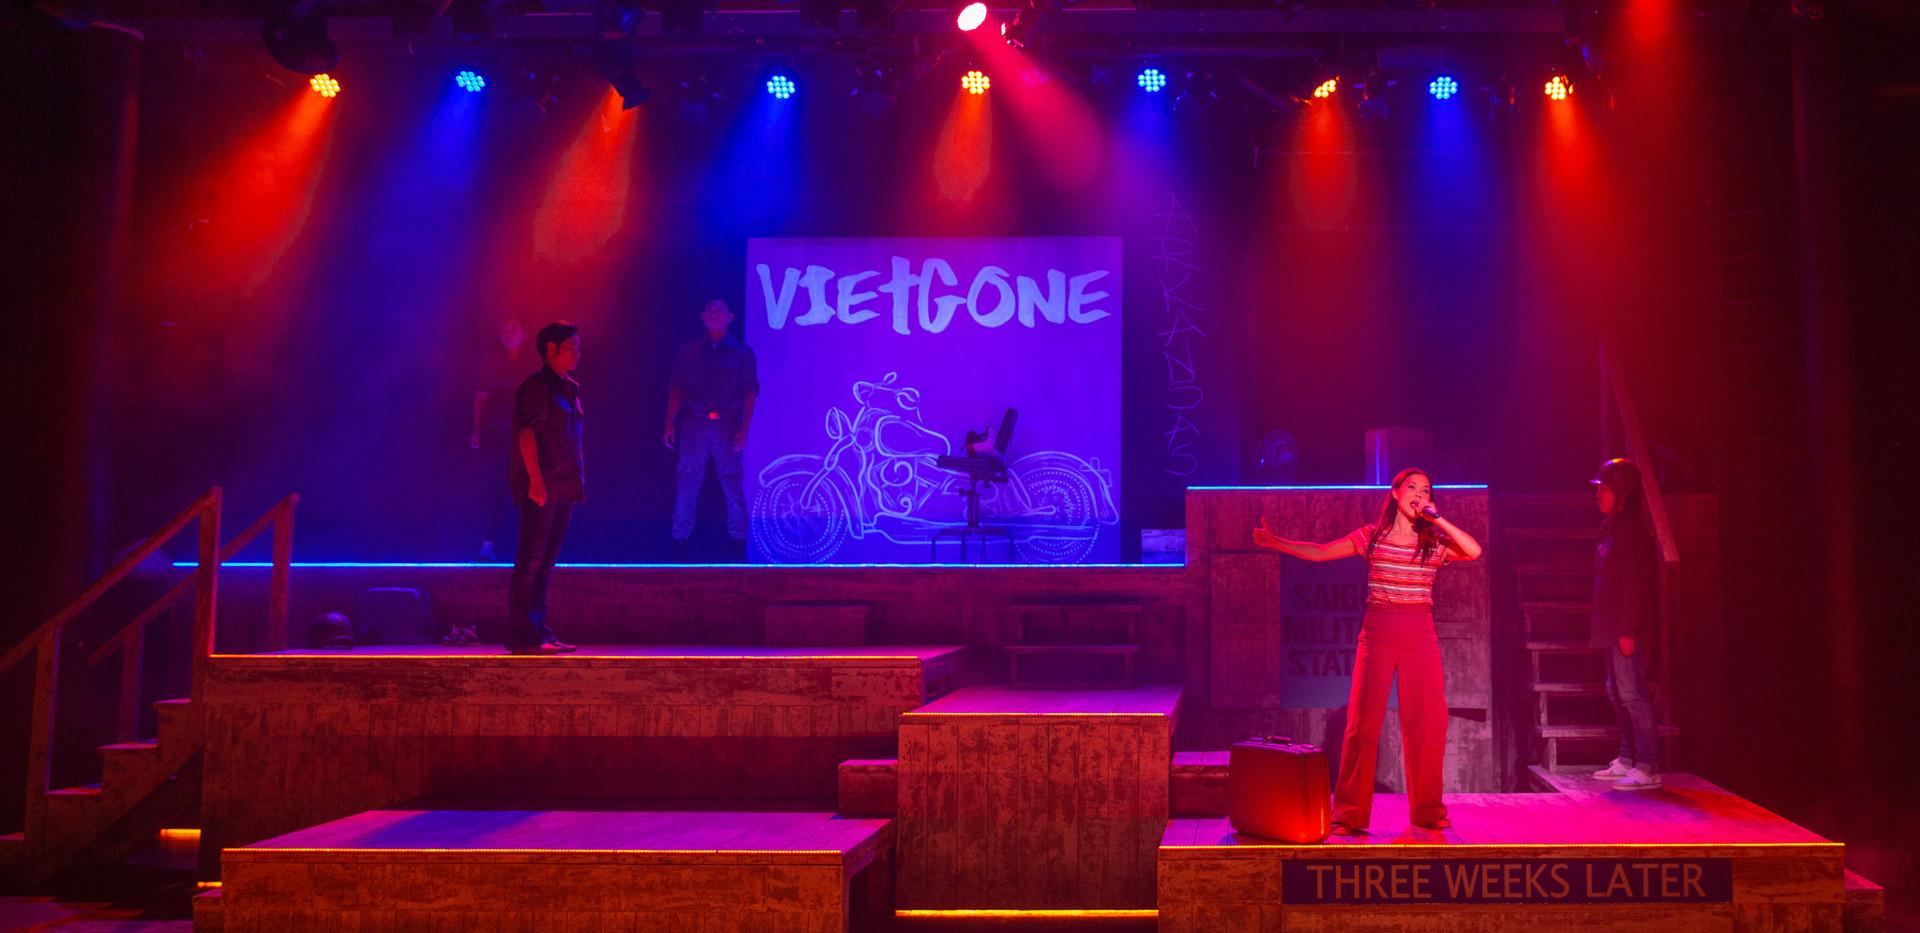 the-company-of-vietgone-photo-by-adamsvi